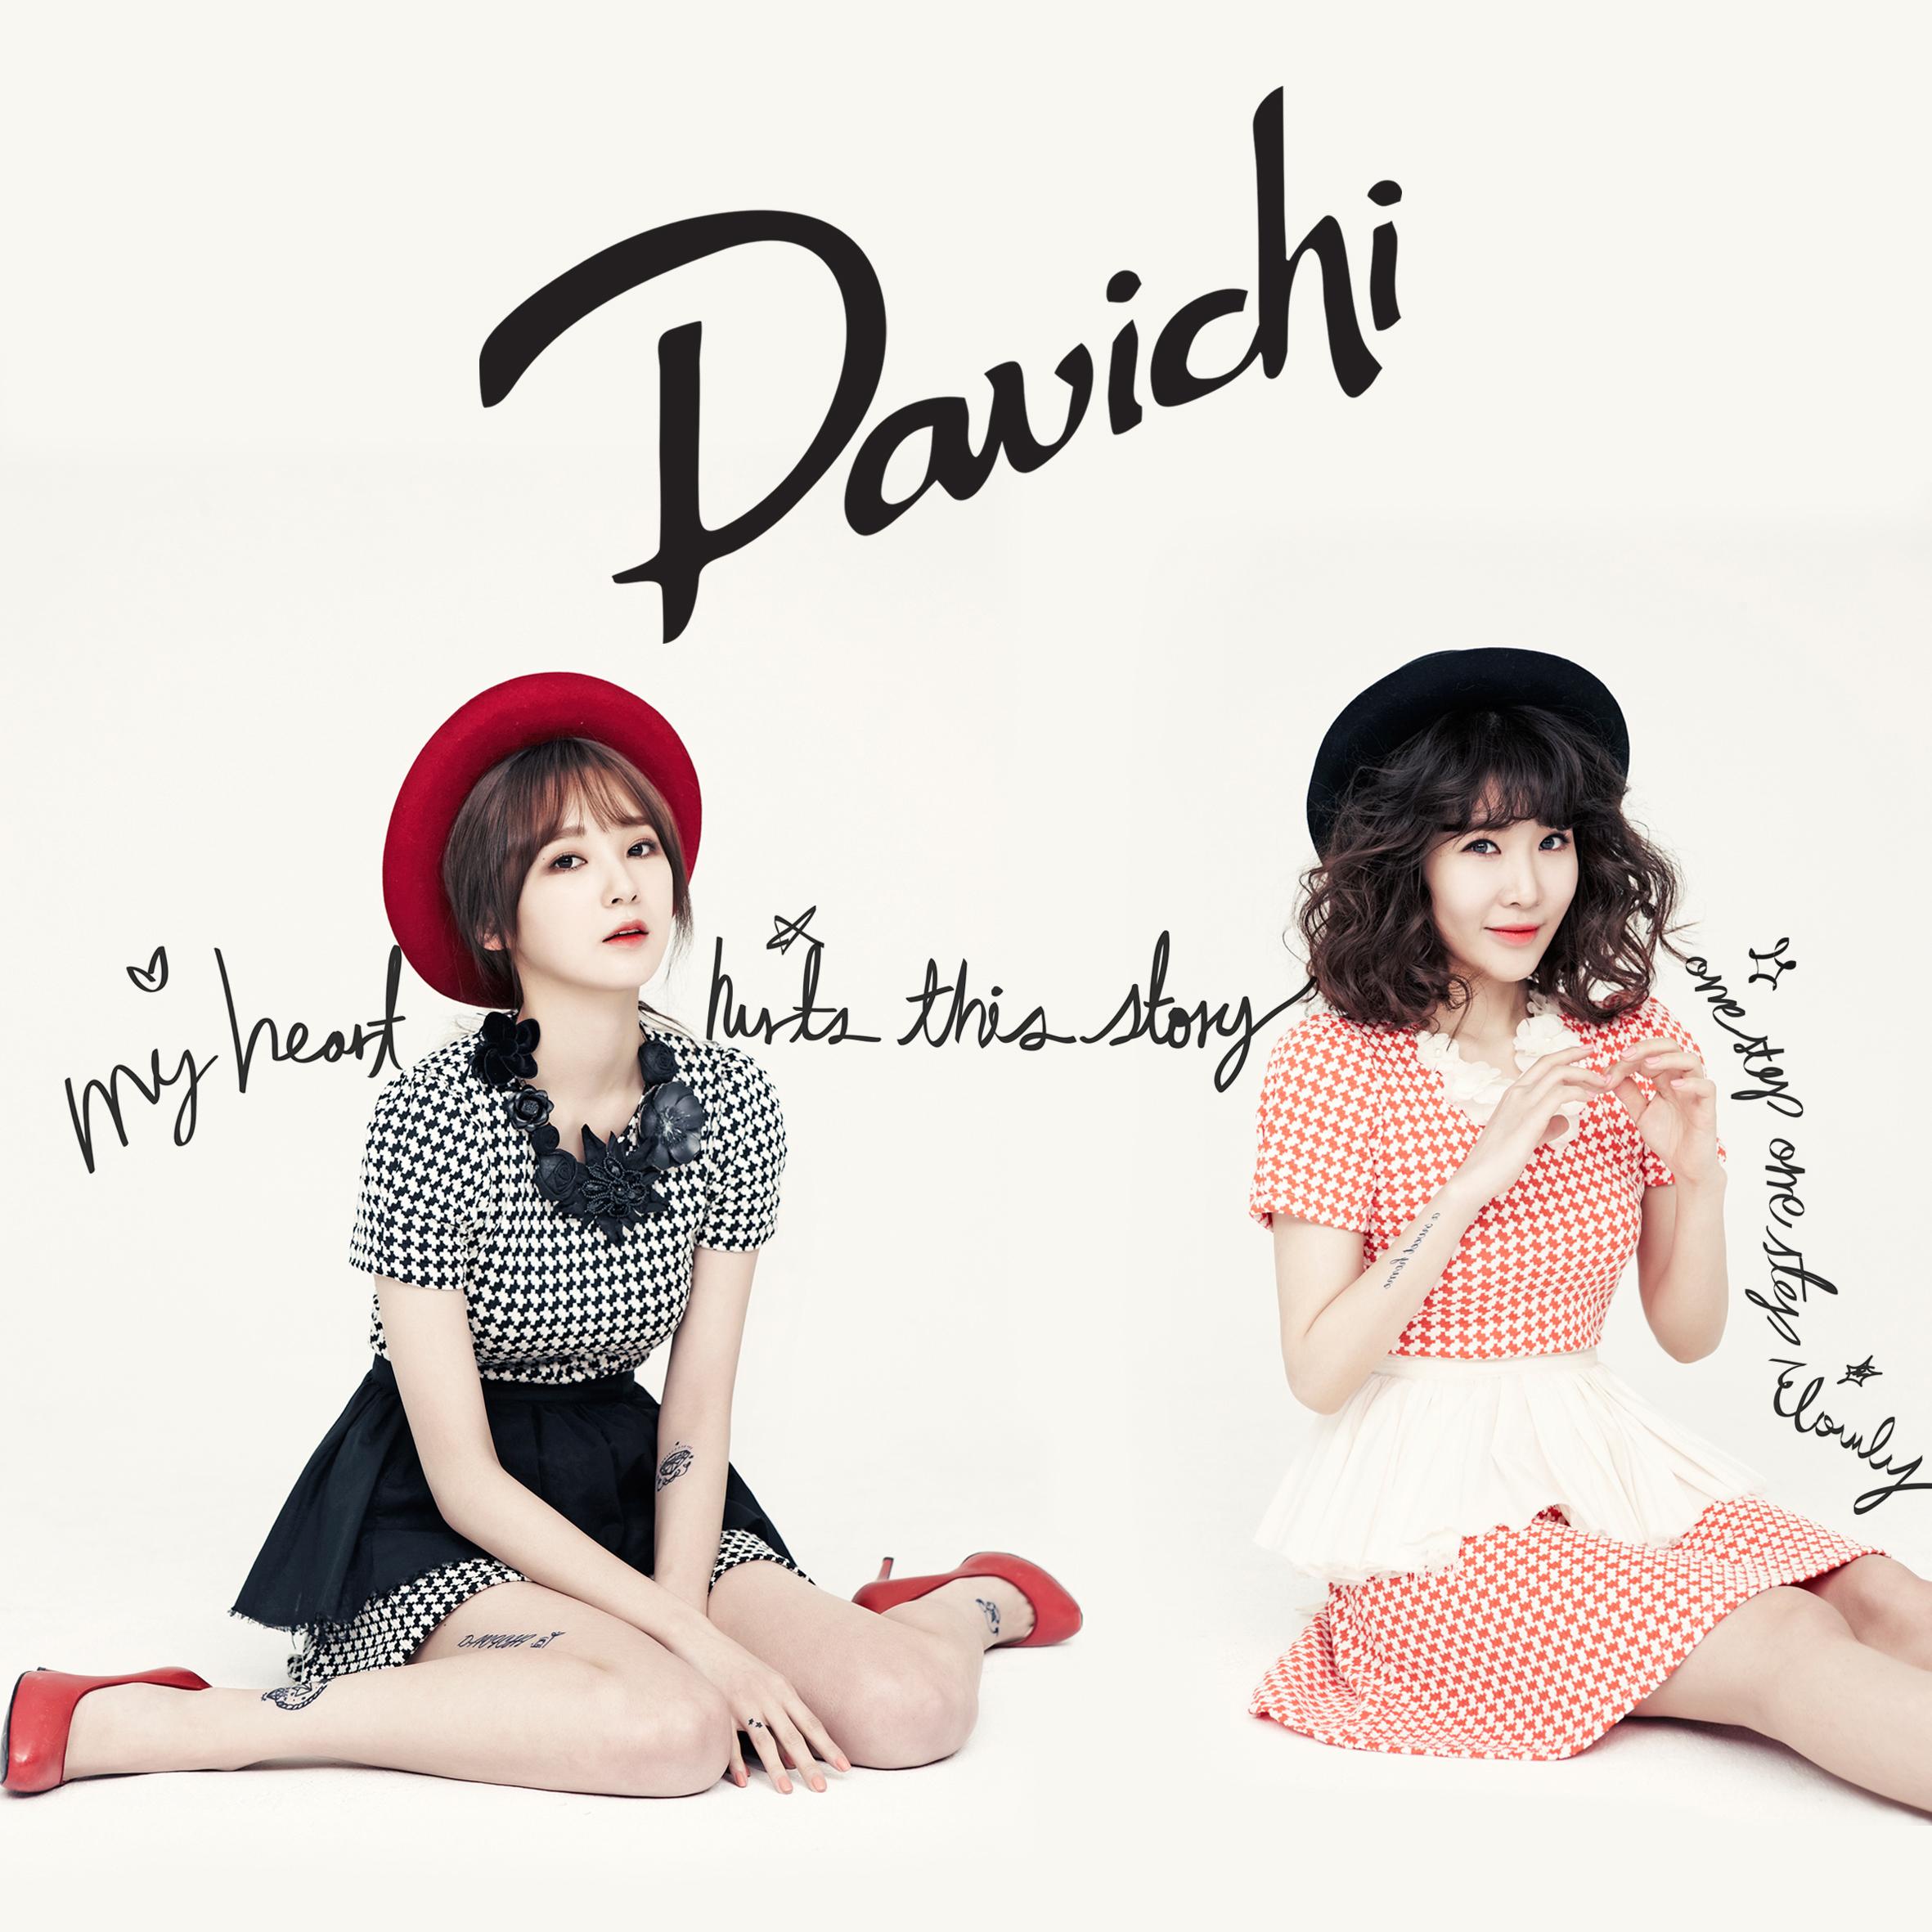 20161117.03.54 Davichi - Mystic Ballad Part.1 cover.jpg